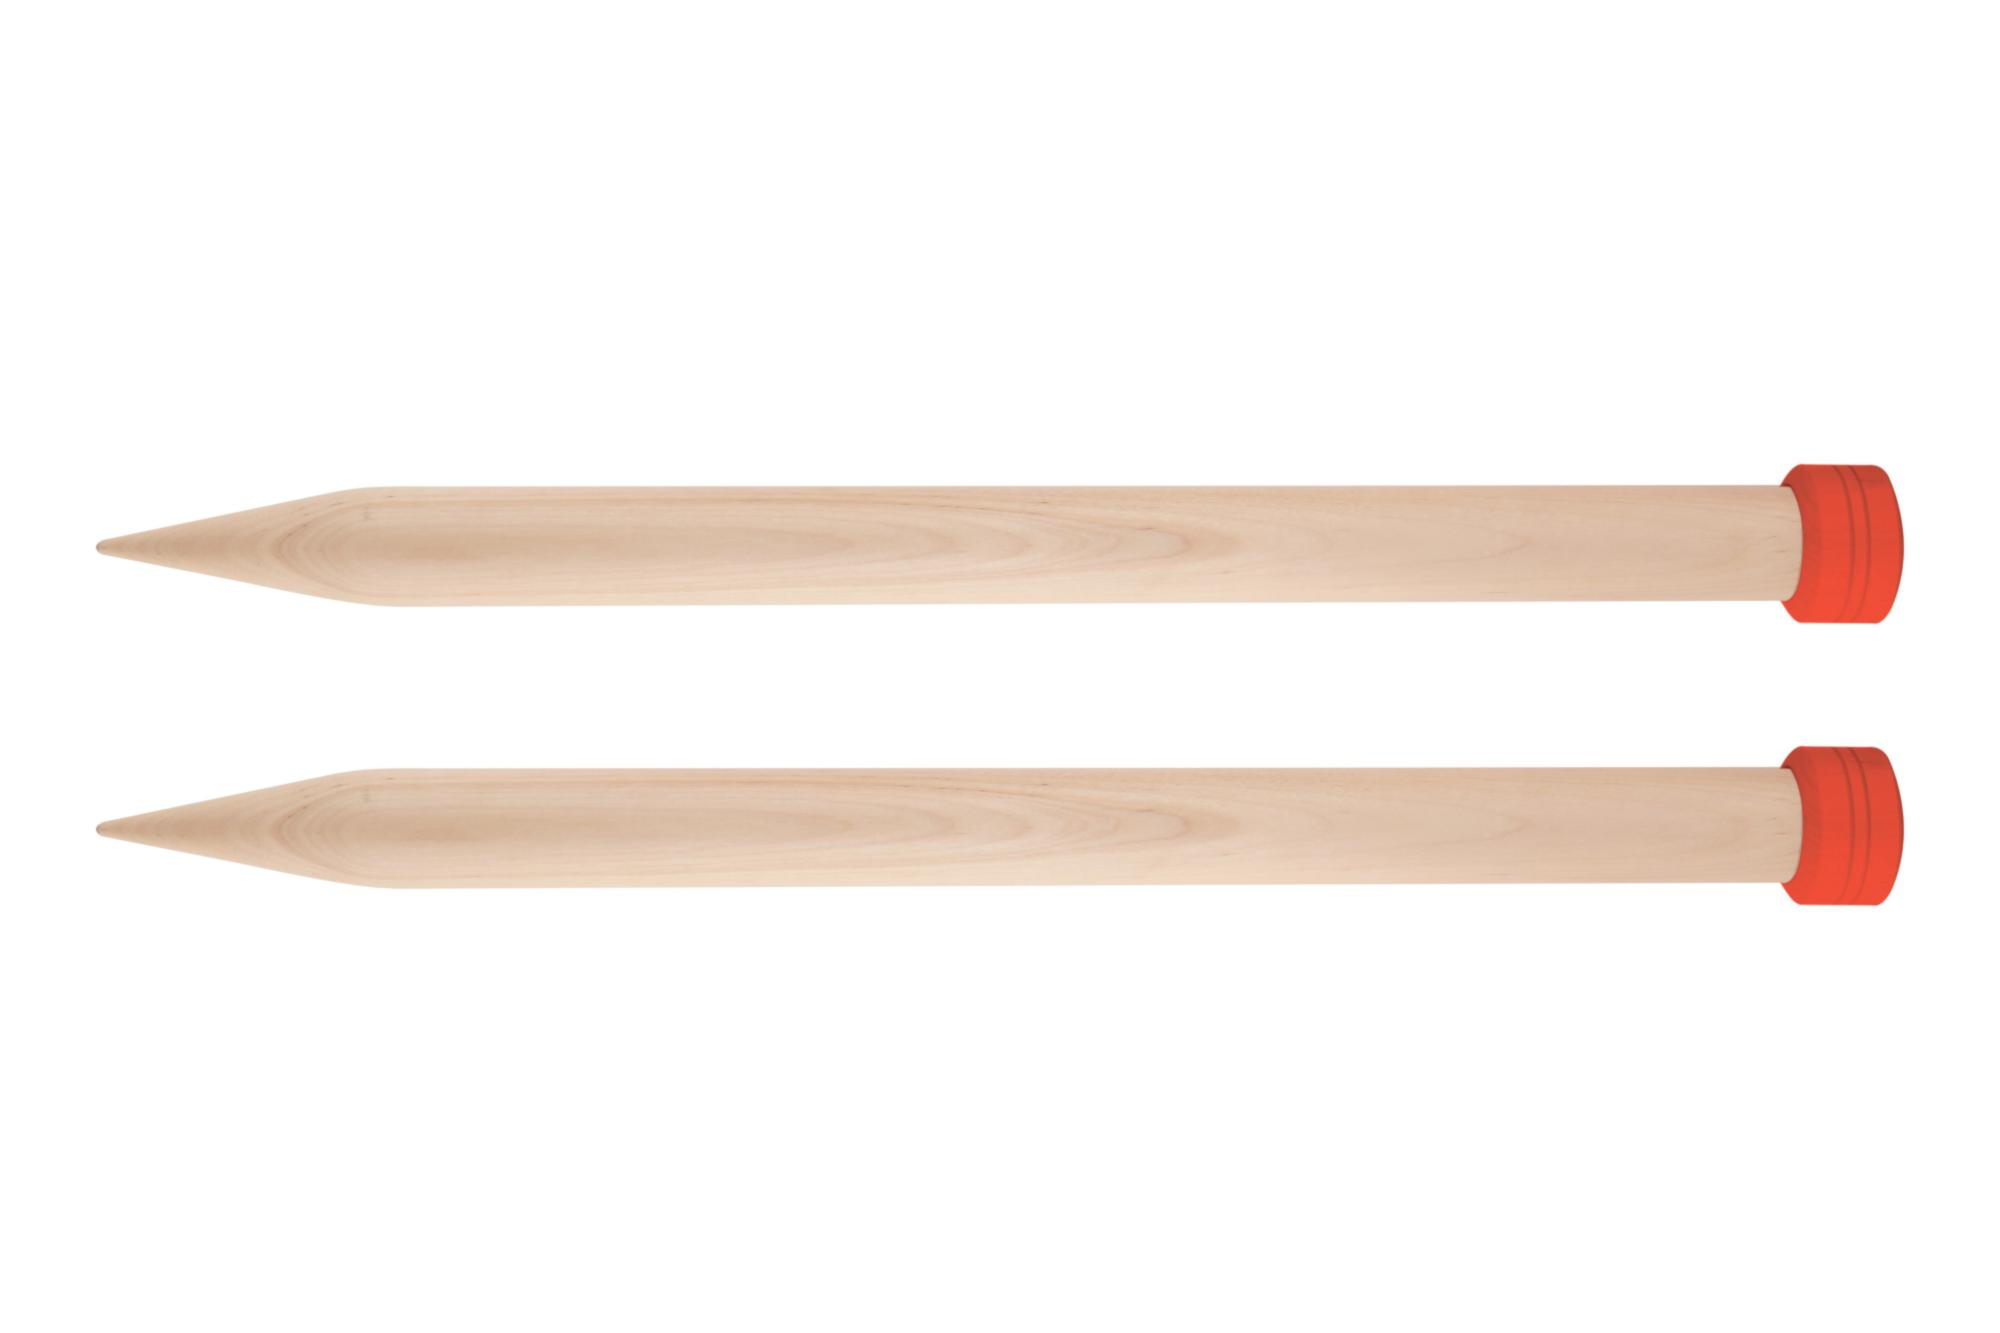 Спицы прямые 40 см Jumbo Birch KnitPro, 35292, 30.00 мм